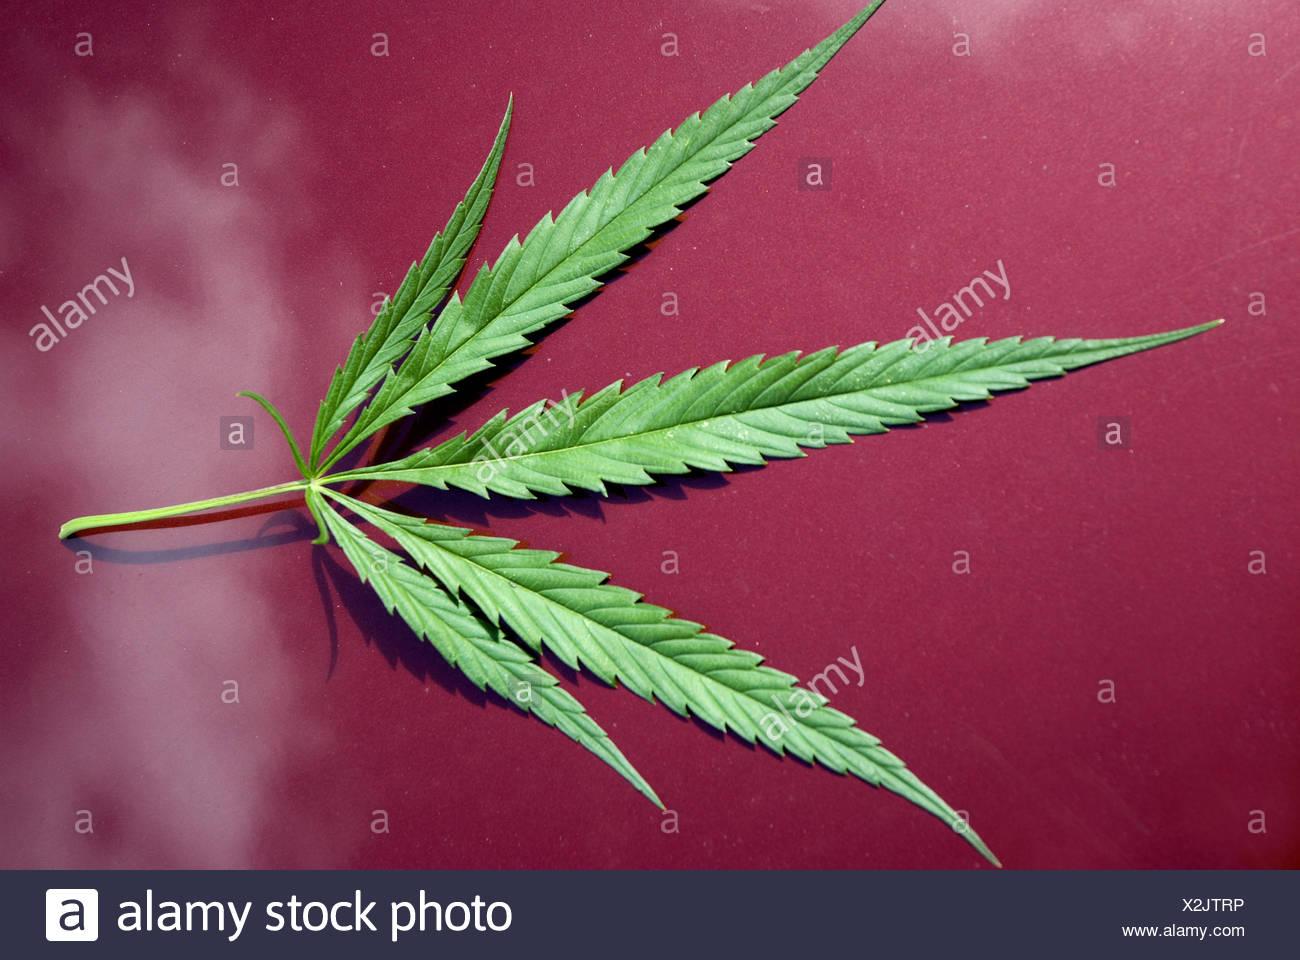 Hemp leaves, - Stock Image